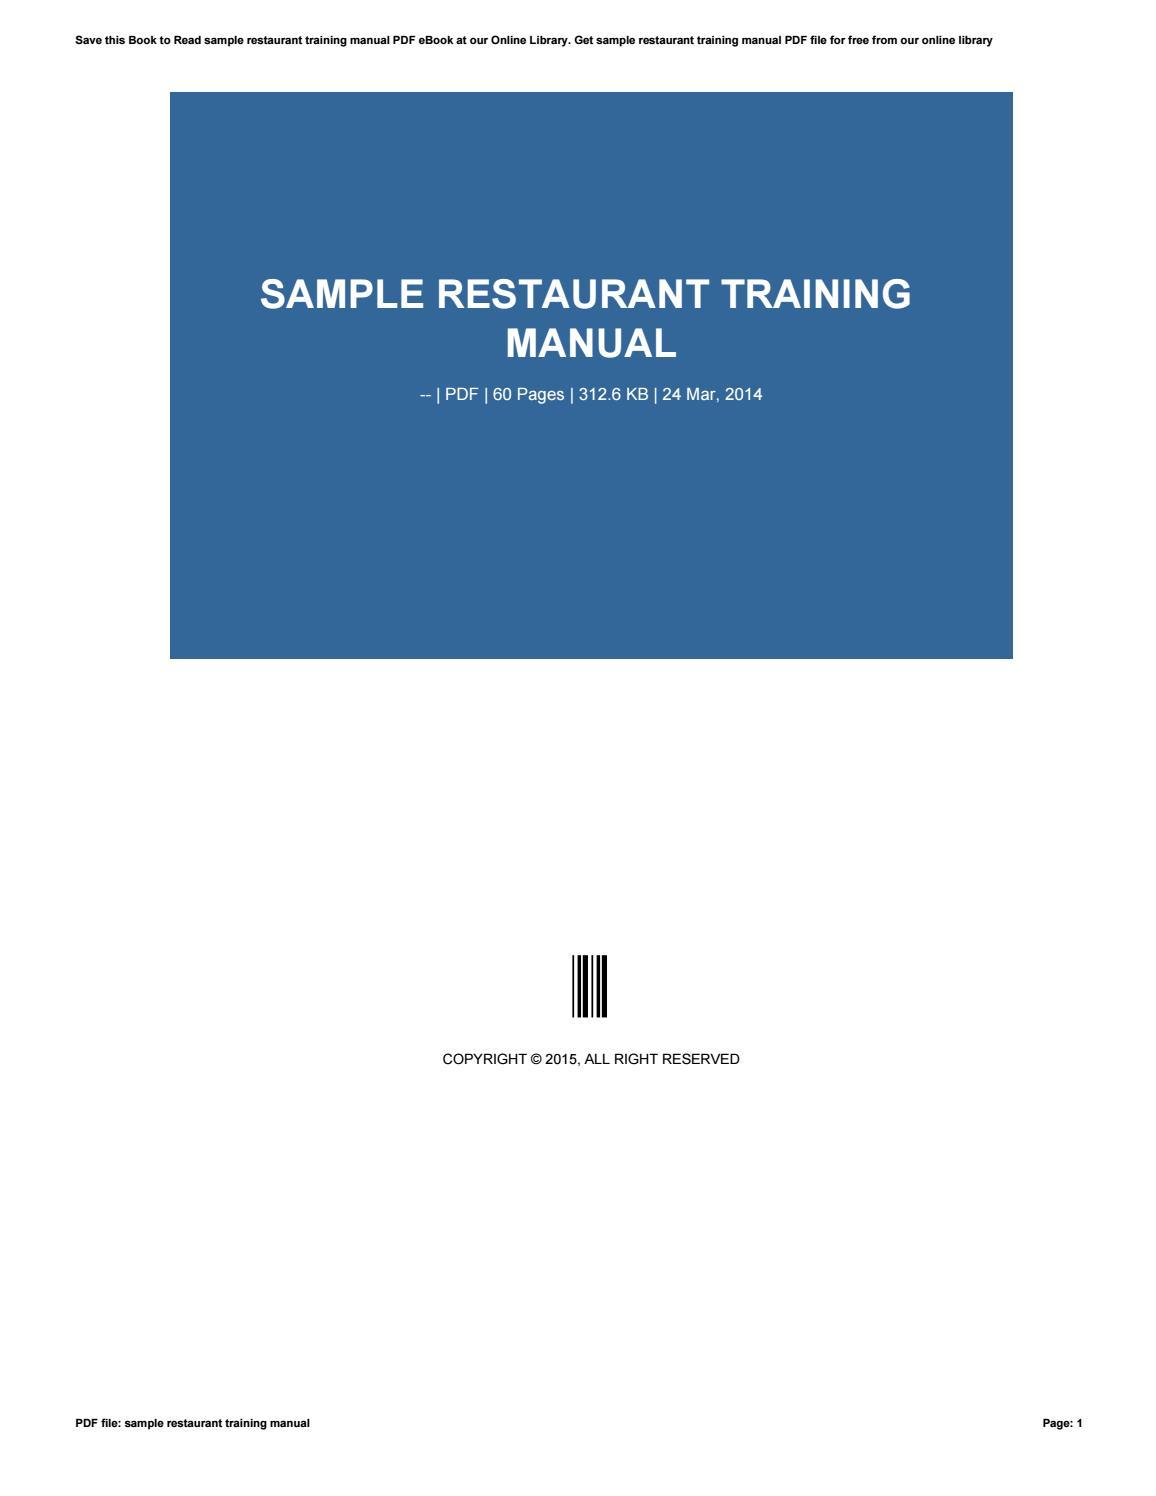 Sample Training Manual Template from image.isu.pub